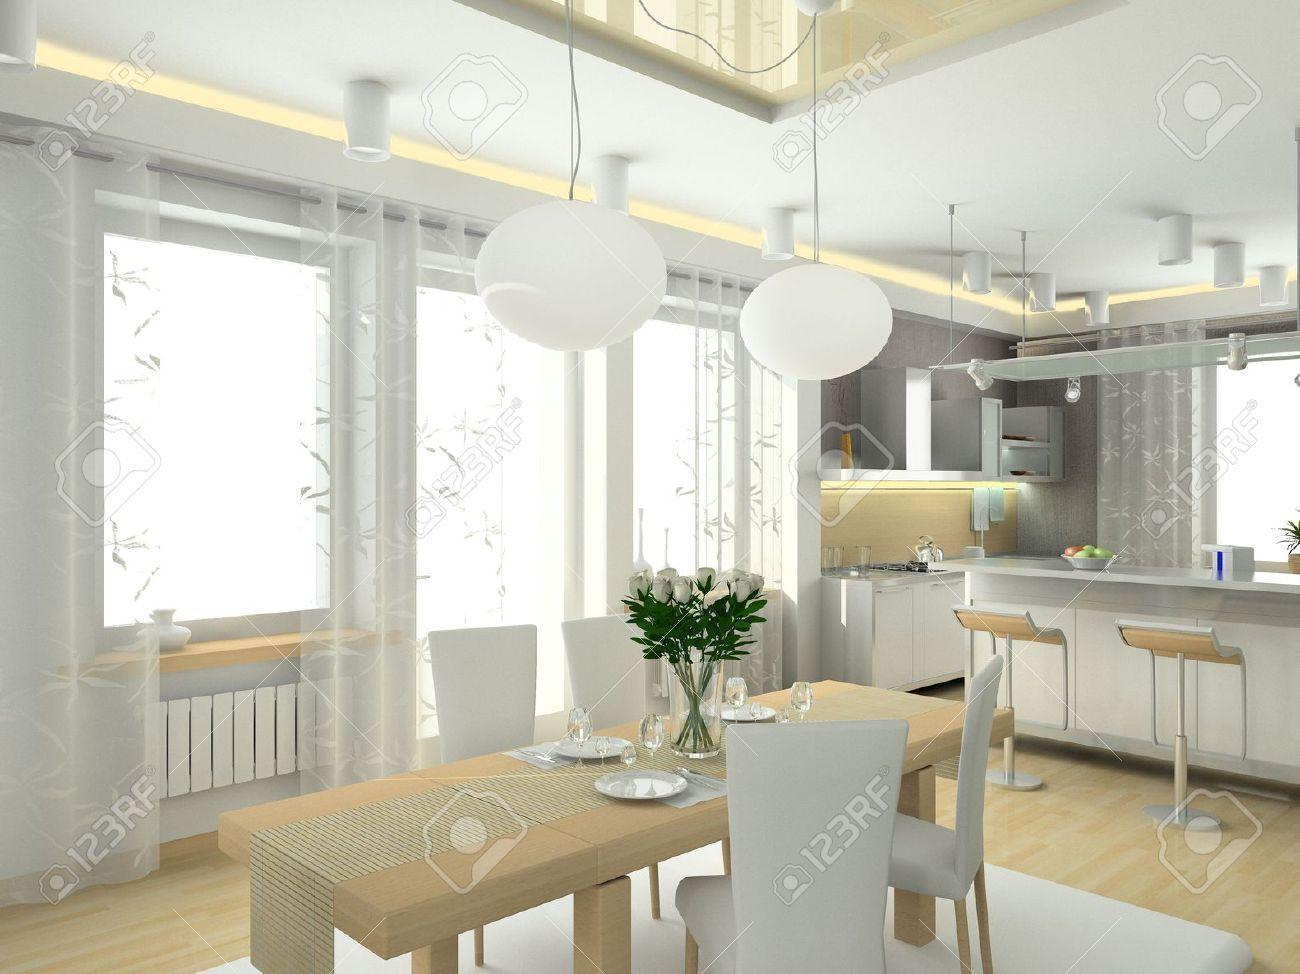 Disegno Cucina 3d. Disegnare Cucina D Idee Di Design Per La Casa ...